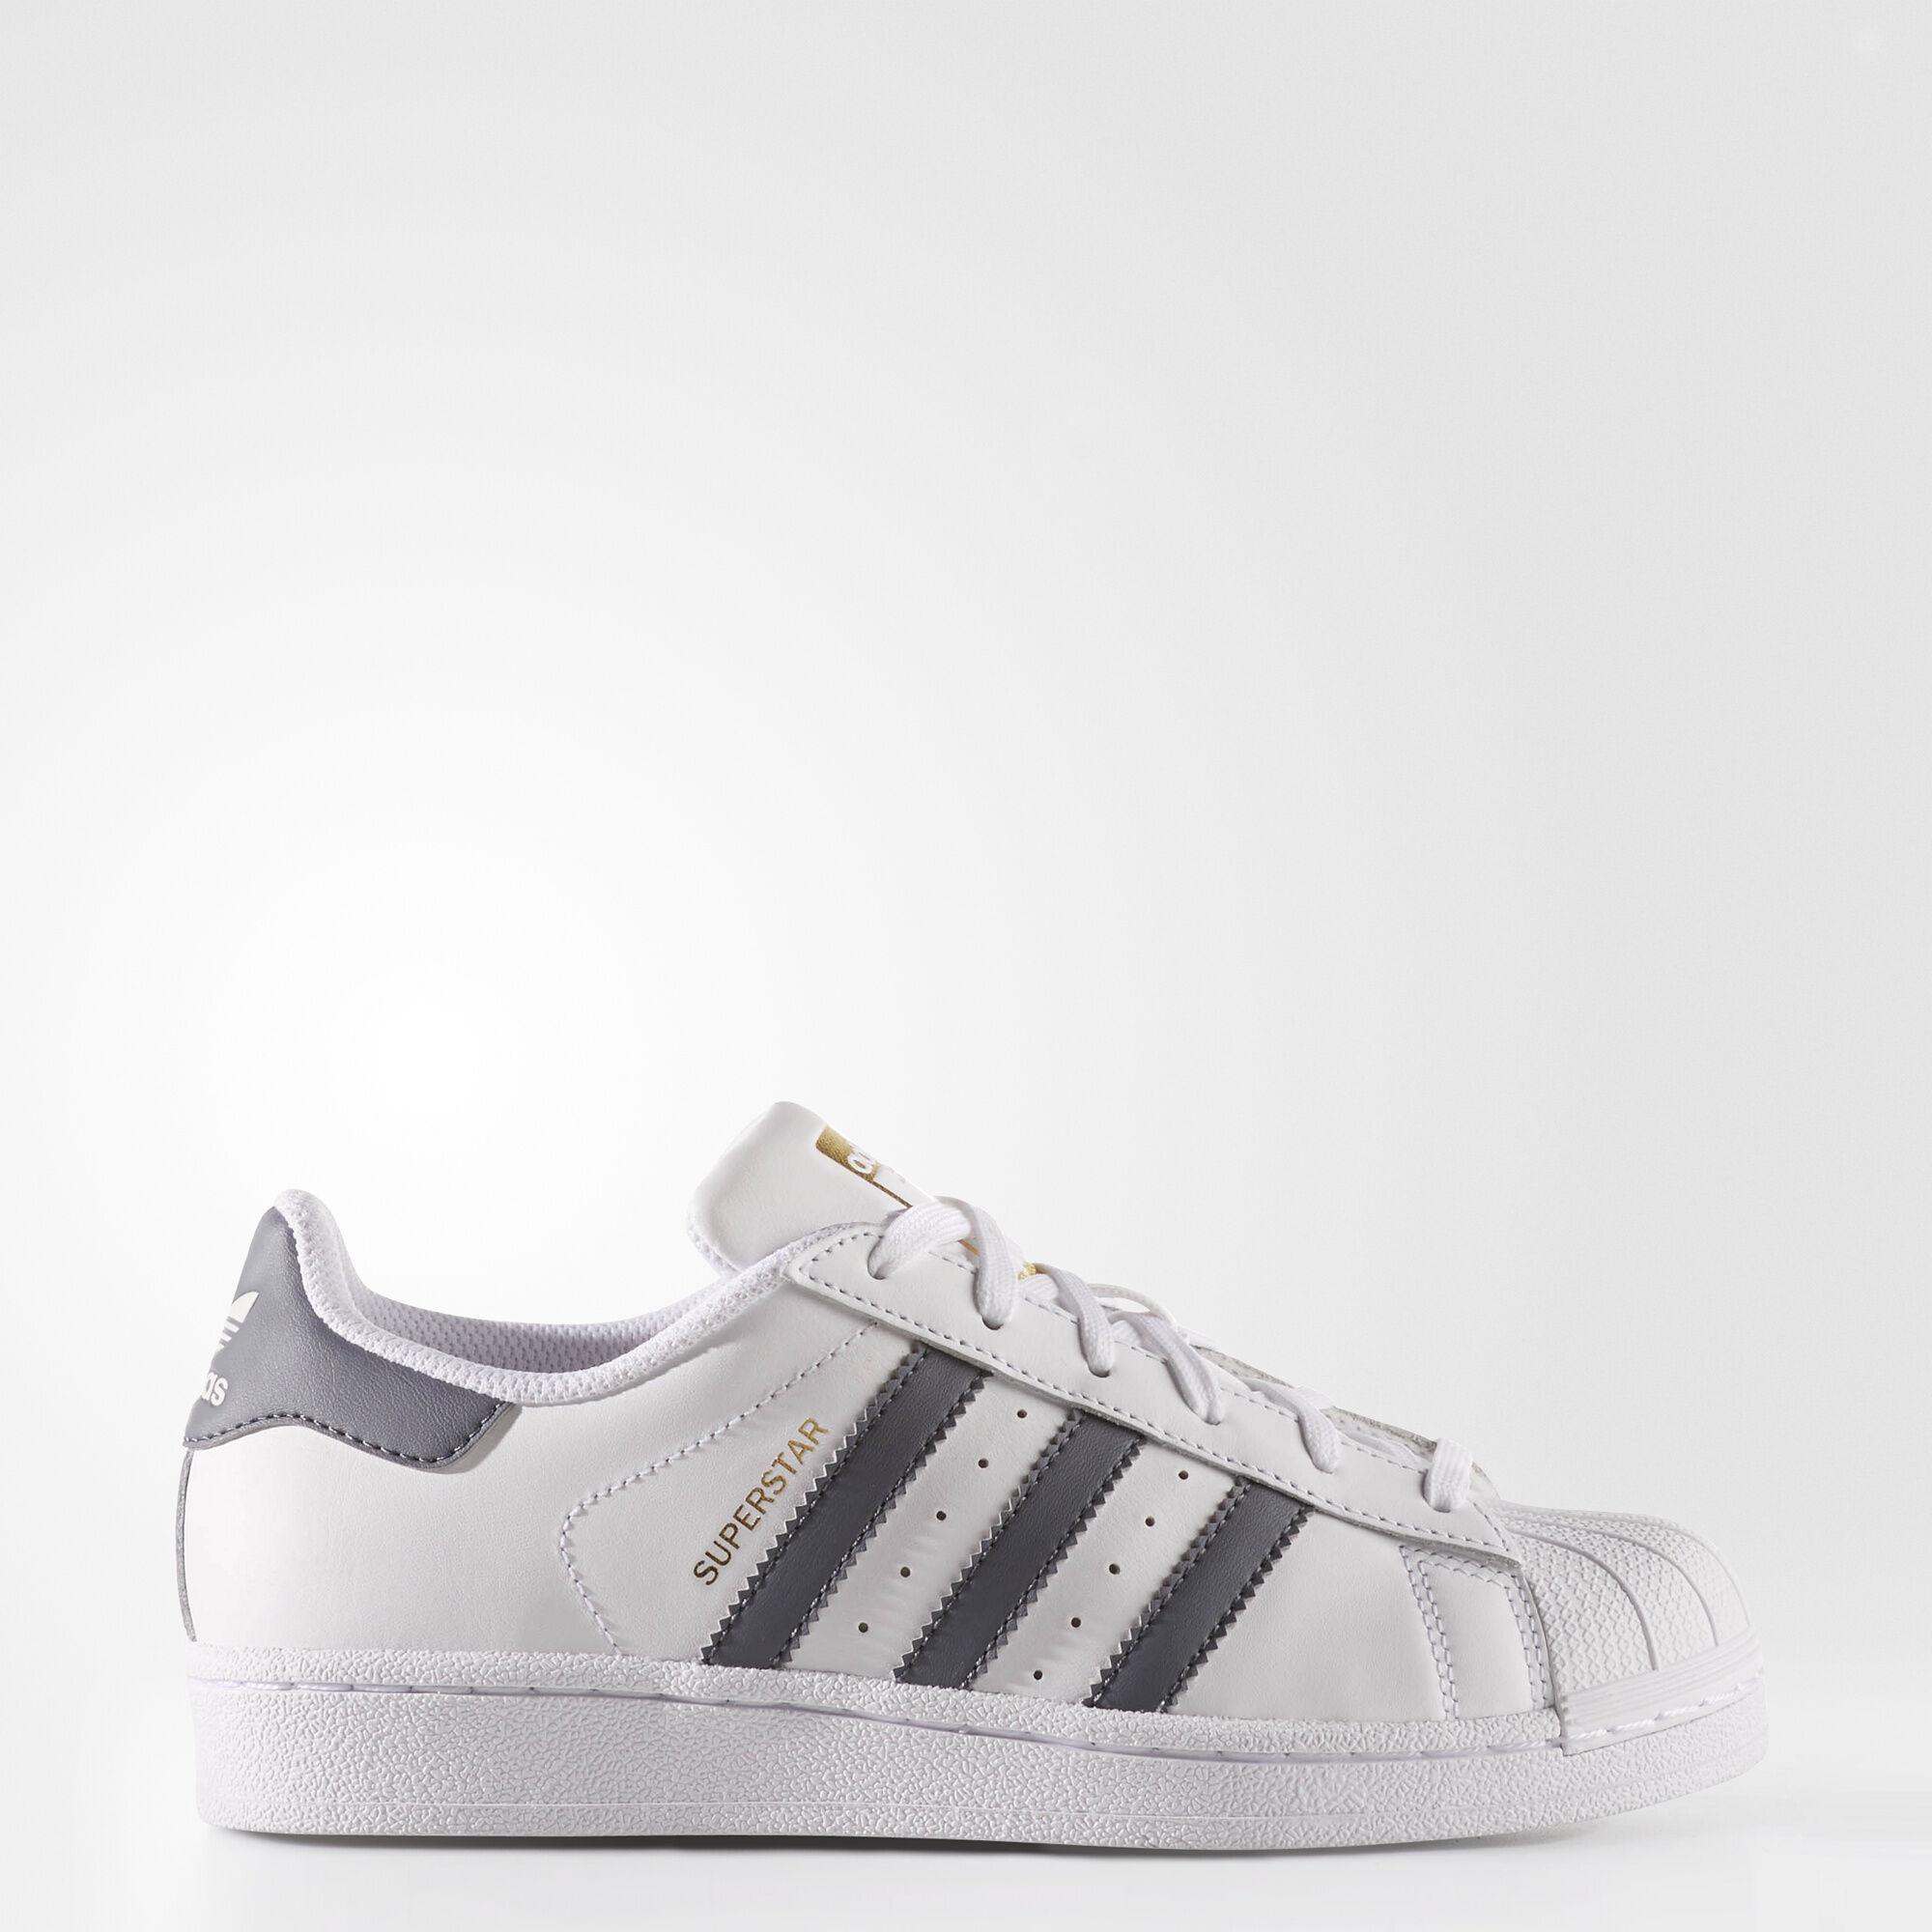 adidas shoes softwaretutor co uk